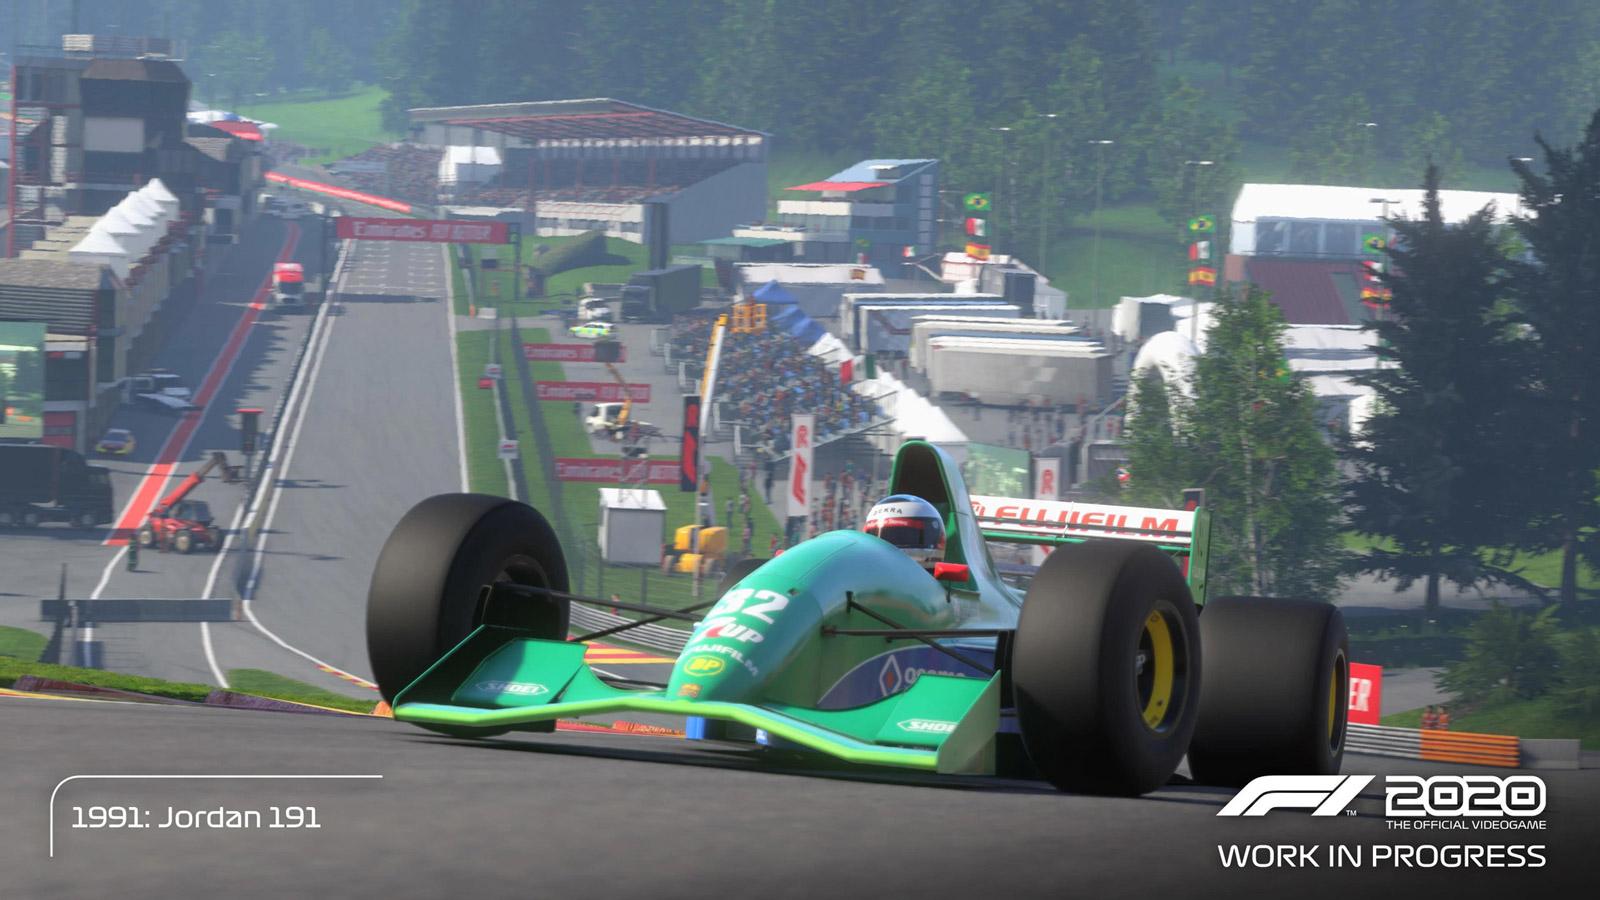 F1 2020 Wallpaper in 1600x900